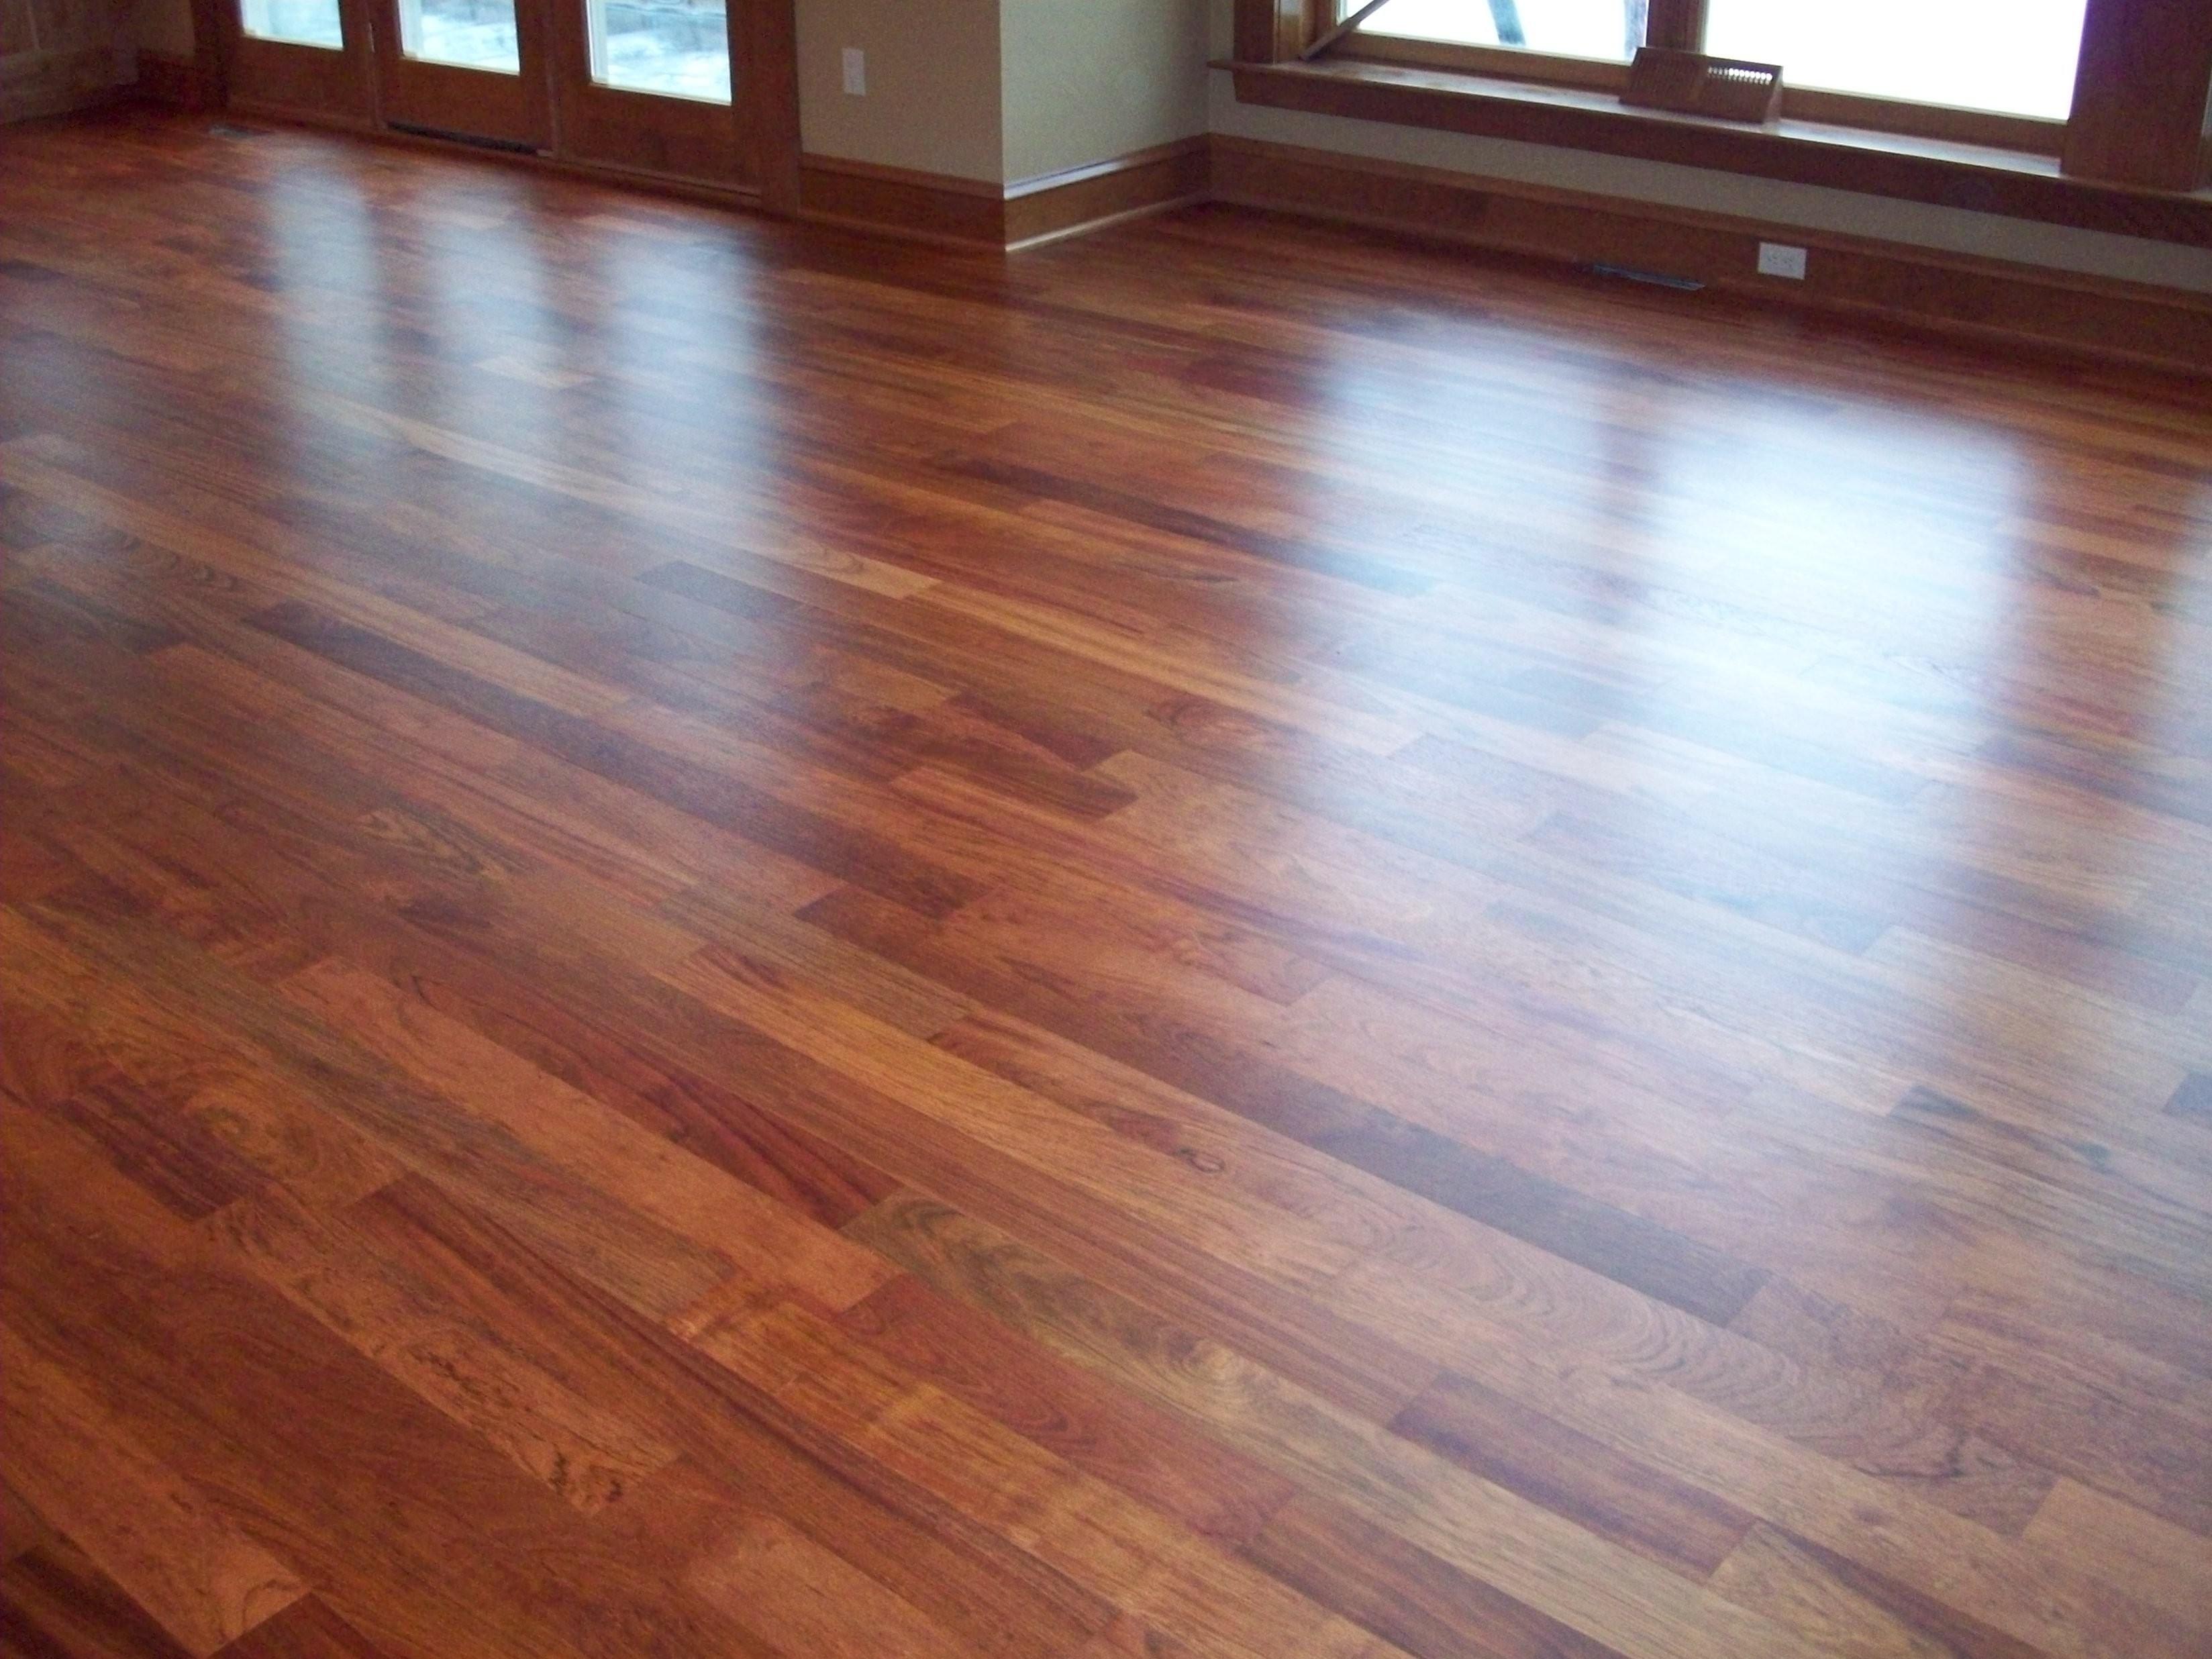 shark hardwood floor steam cleaner reviews of 15 luxury steam mop for hardwood floors stock dizpos com for steam mop for hardwood floors awesome best steam cleaner for laminate wood floors images of 15